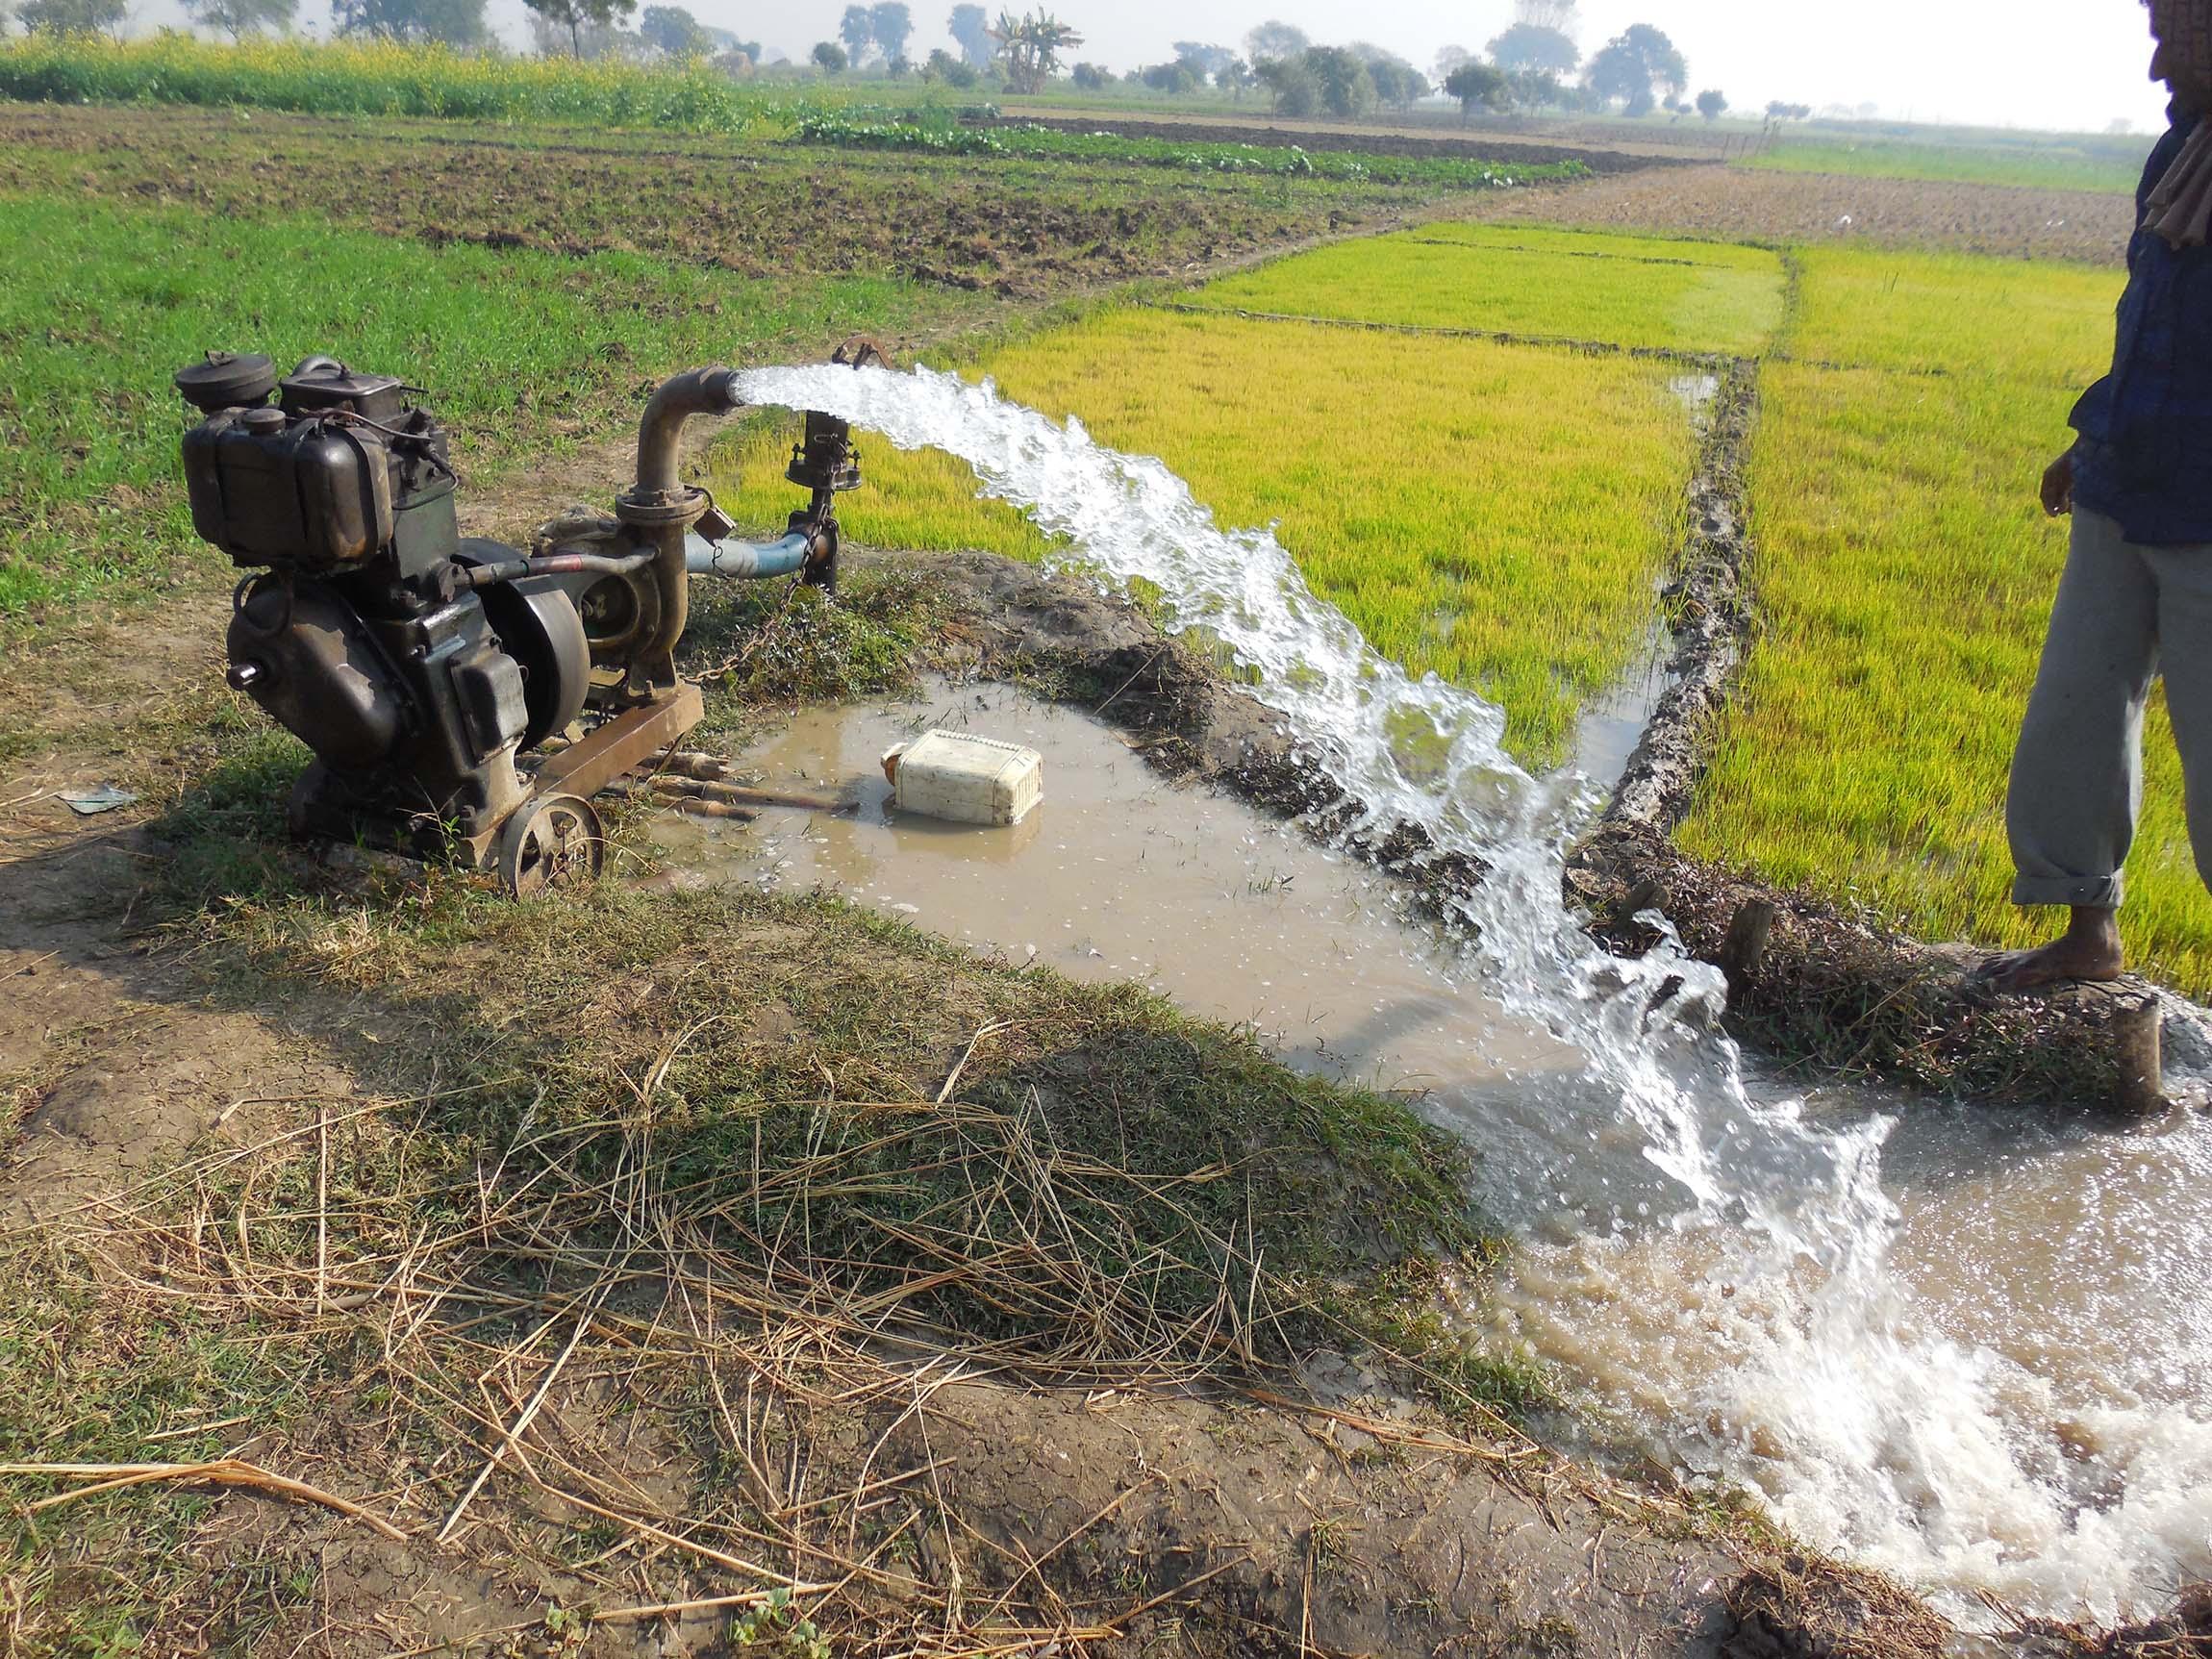 File:Water pump set.JPG - Wikimedia Commons